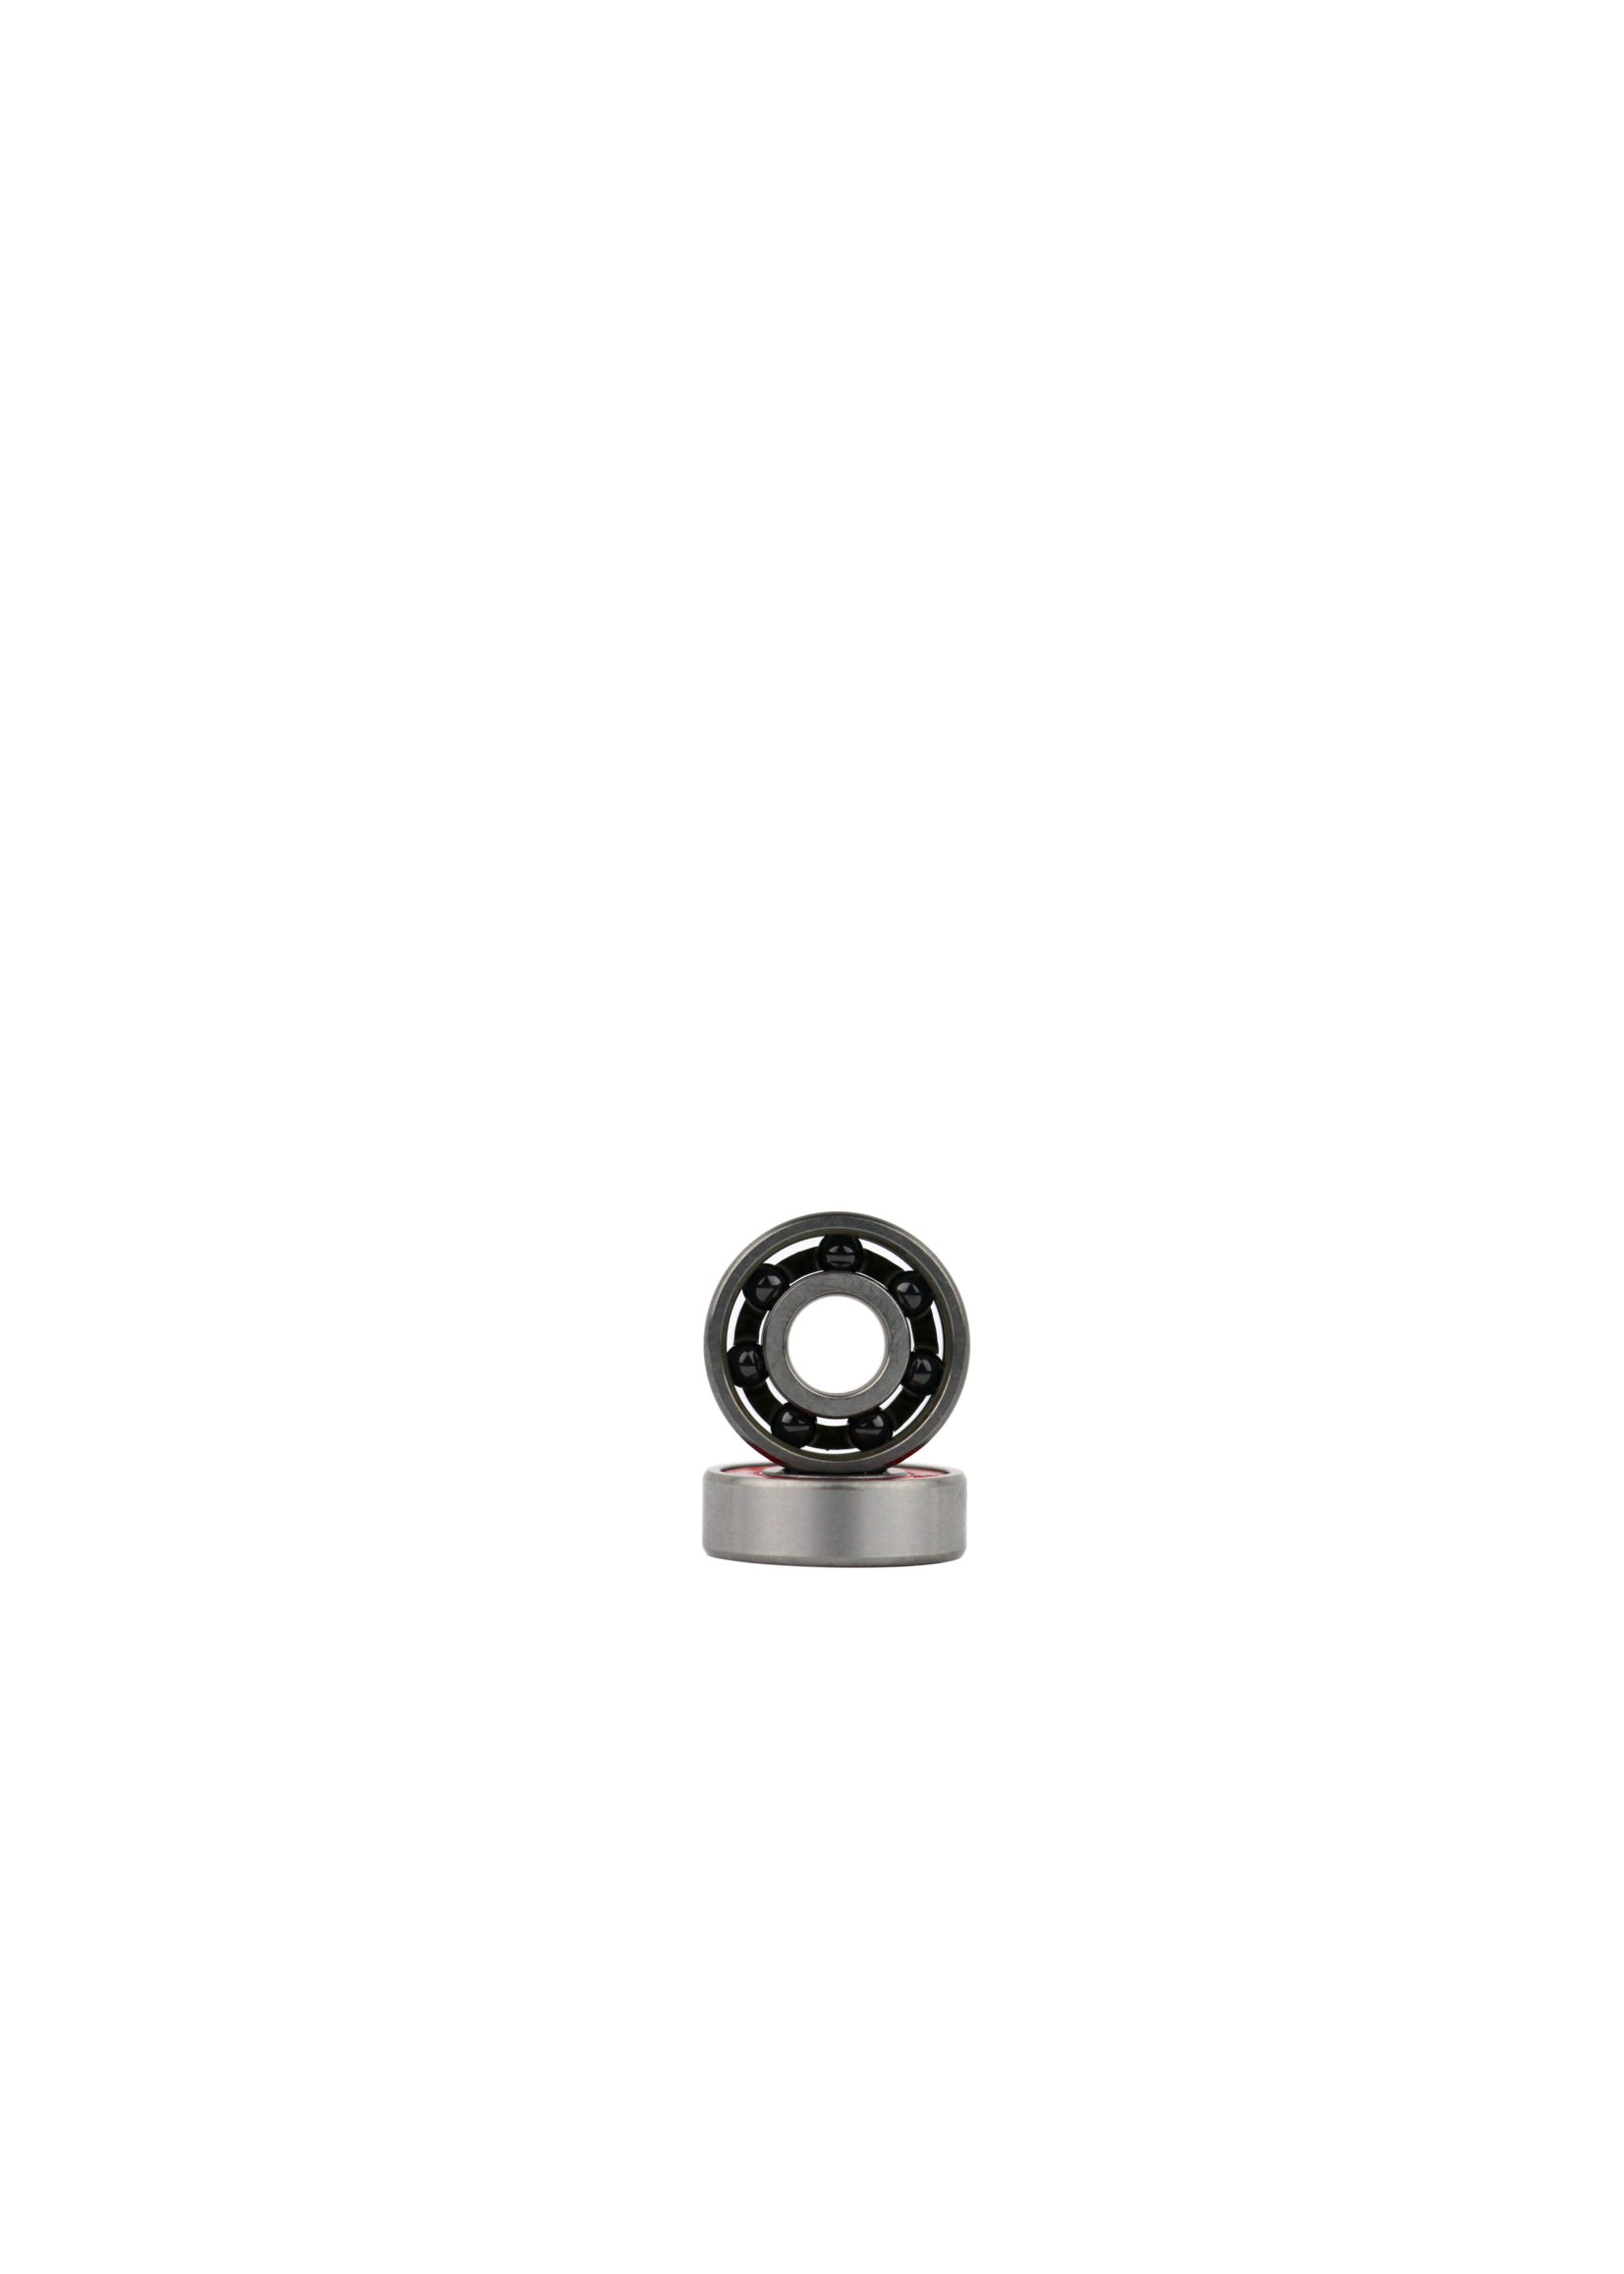 RX Bearings RX Bearings (Ceramic) Abec-9